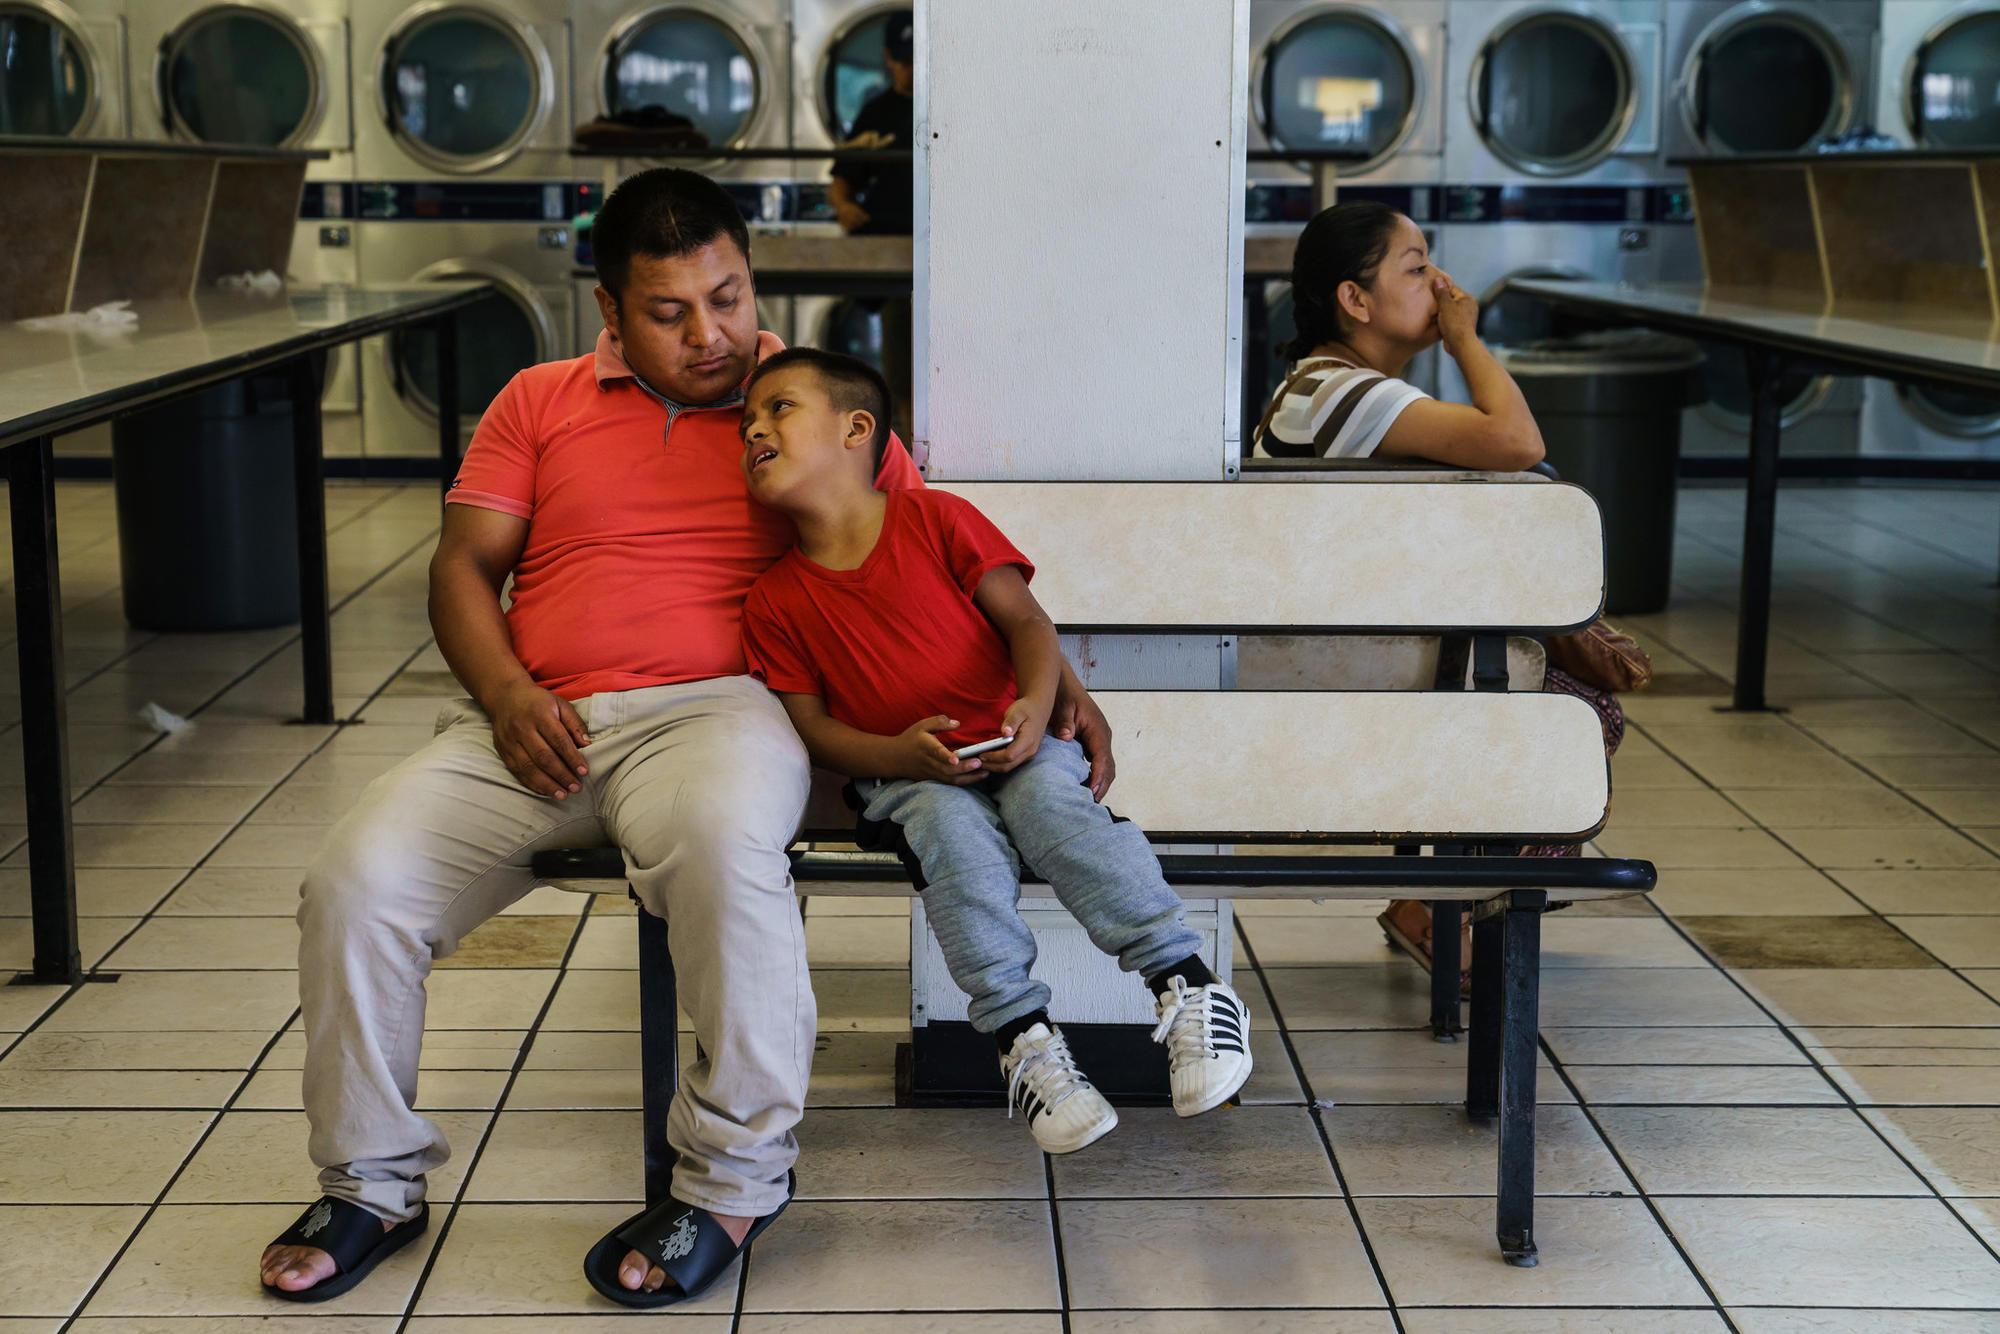 Guatemalan asylum seeker and his son